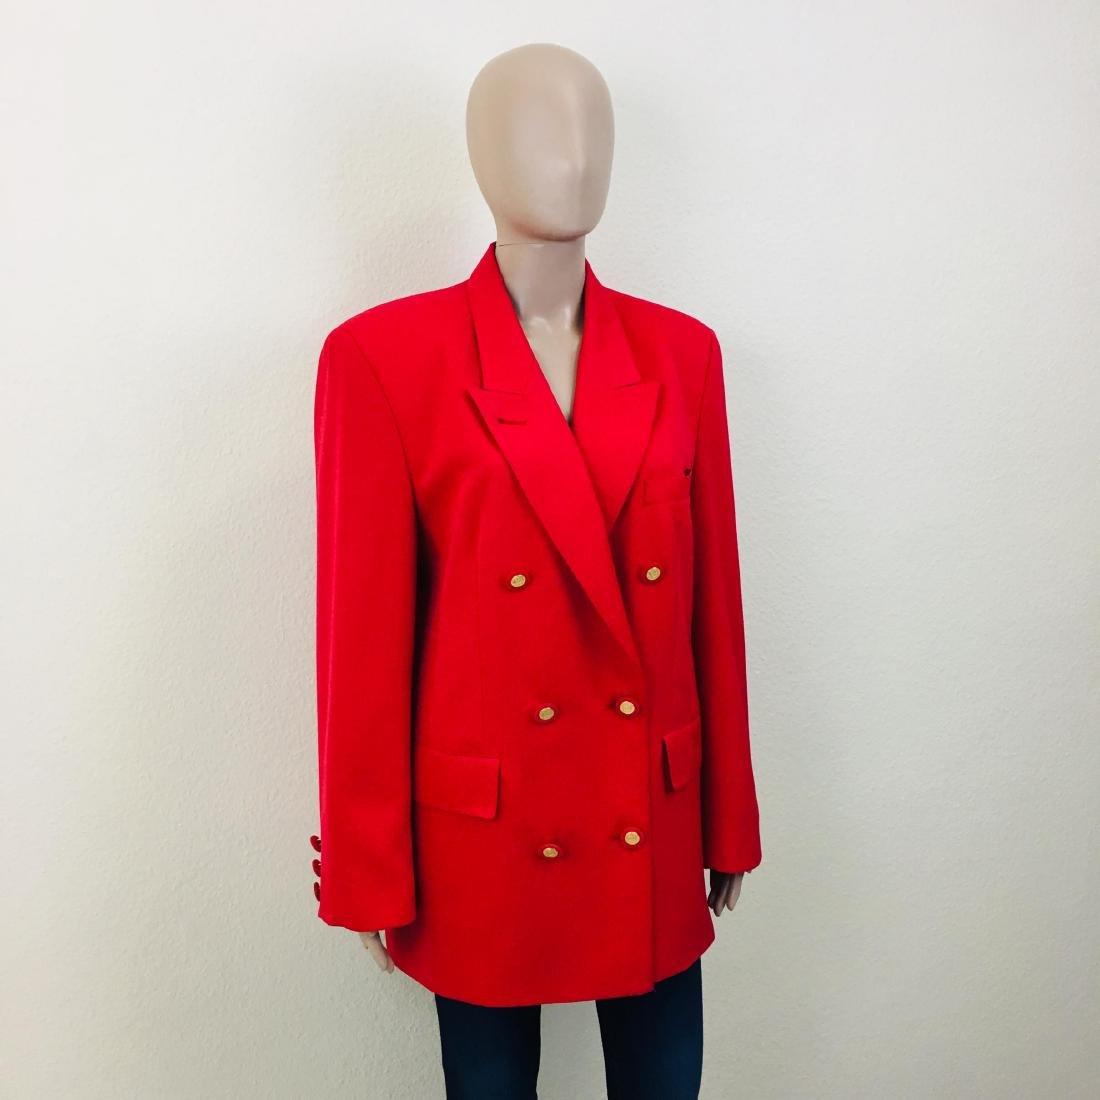 Vintage Women's RAVENS Designer Wool Blend Blazer - 3